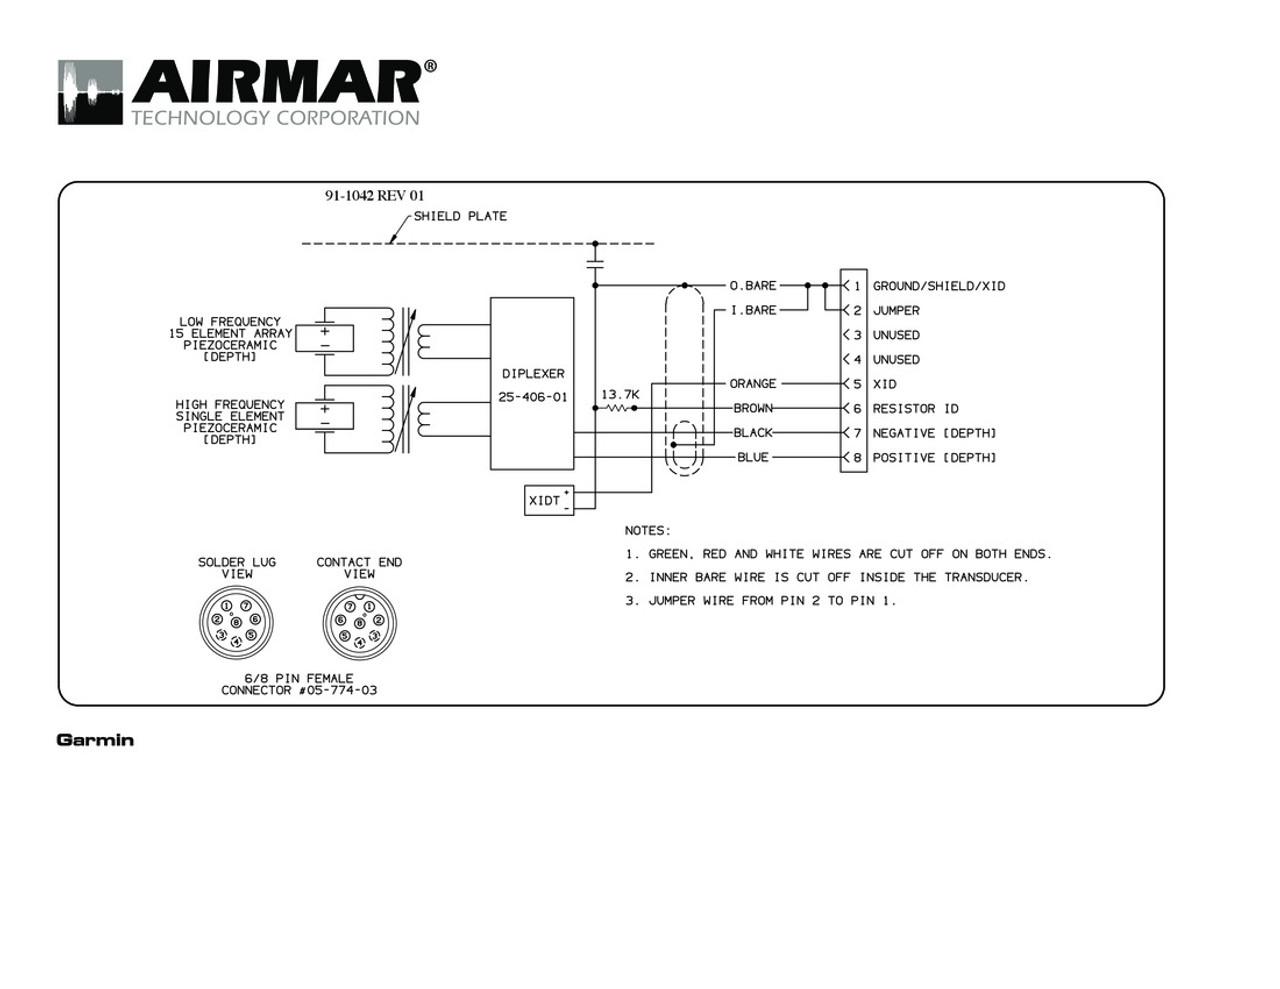 garmin quest wiring diagram wiring diagrams core garmin 3010c wiring diagram garmin 3010c wiring diagram #15